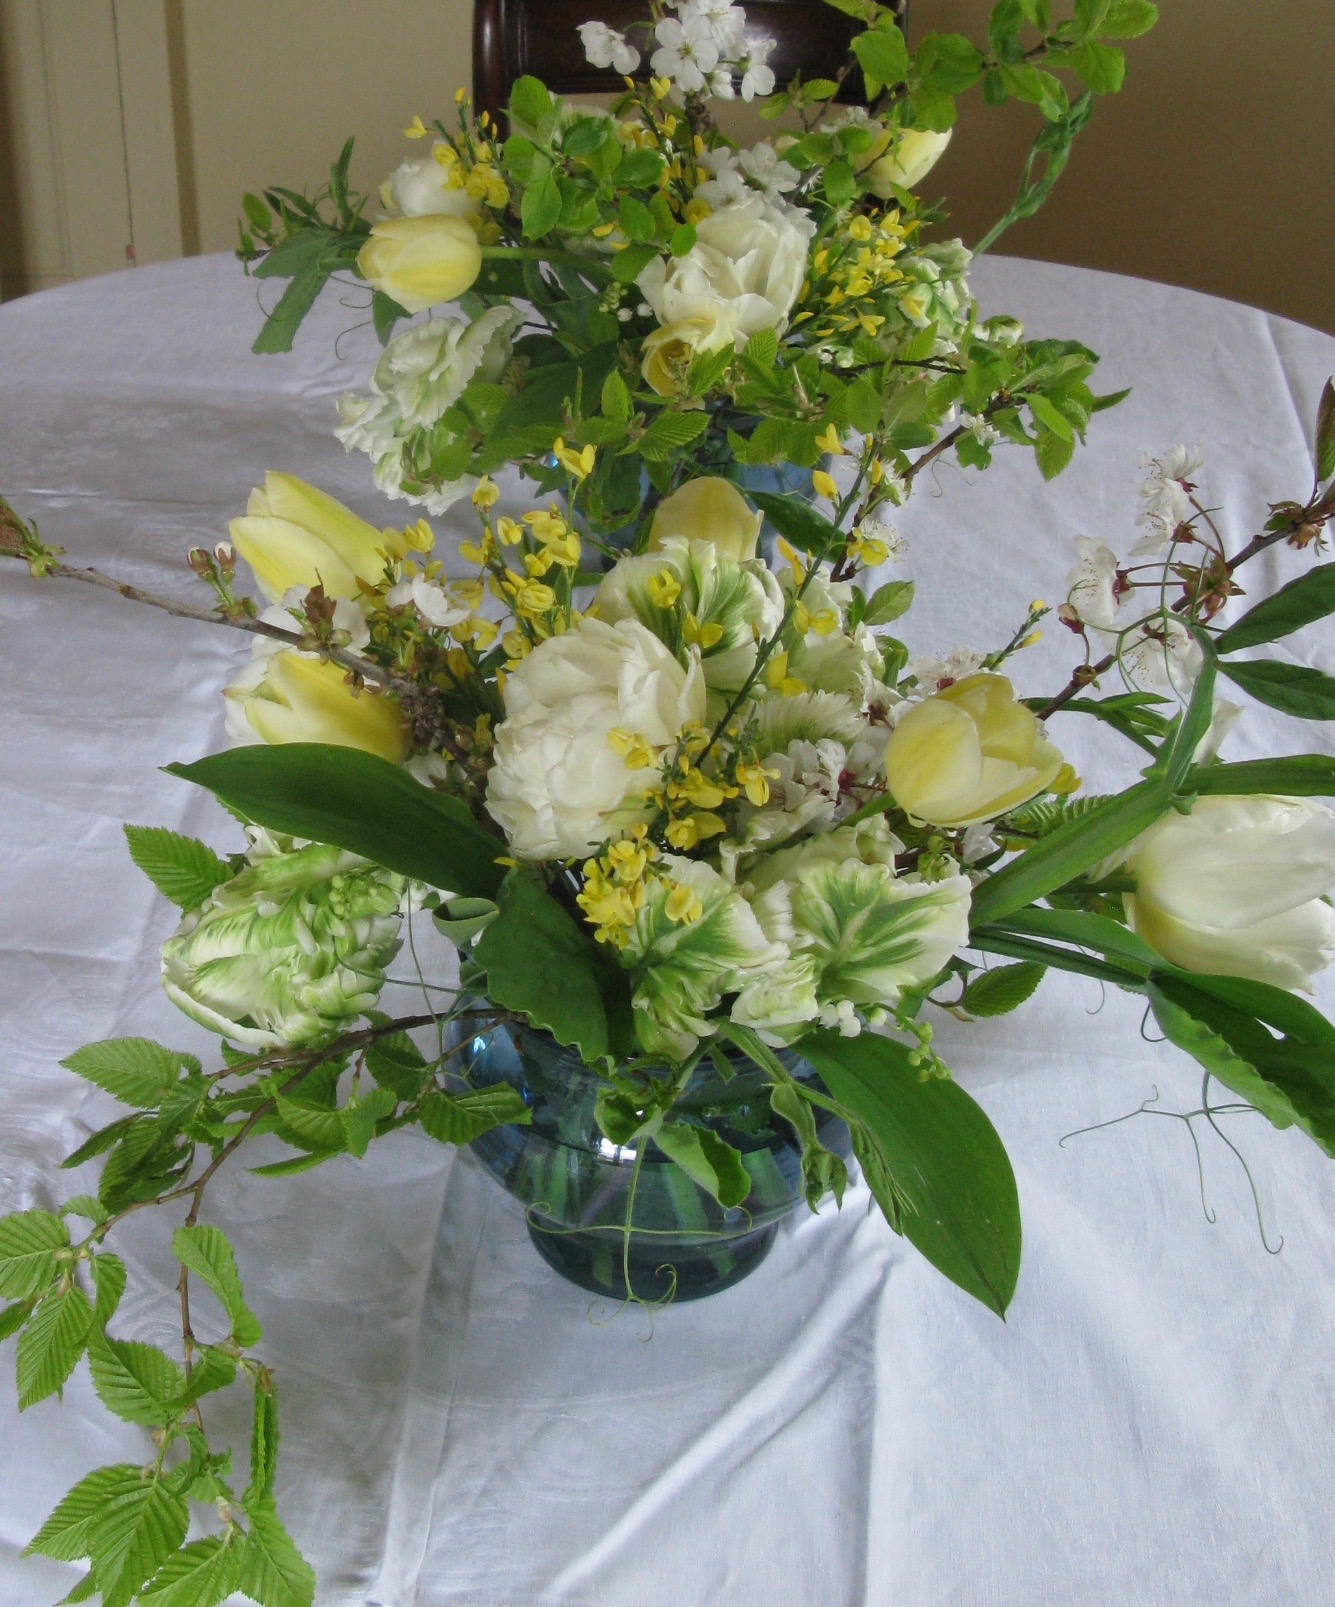 Spring-wedding-table-arrangements